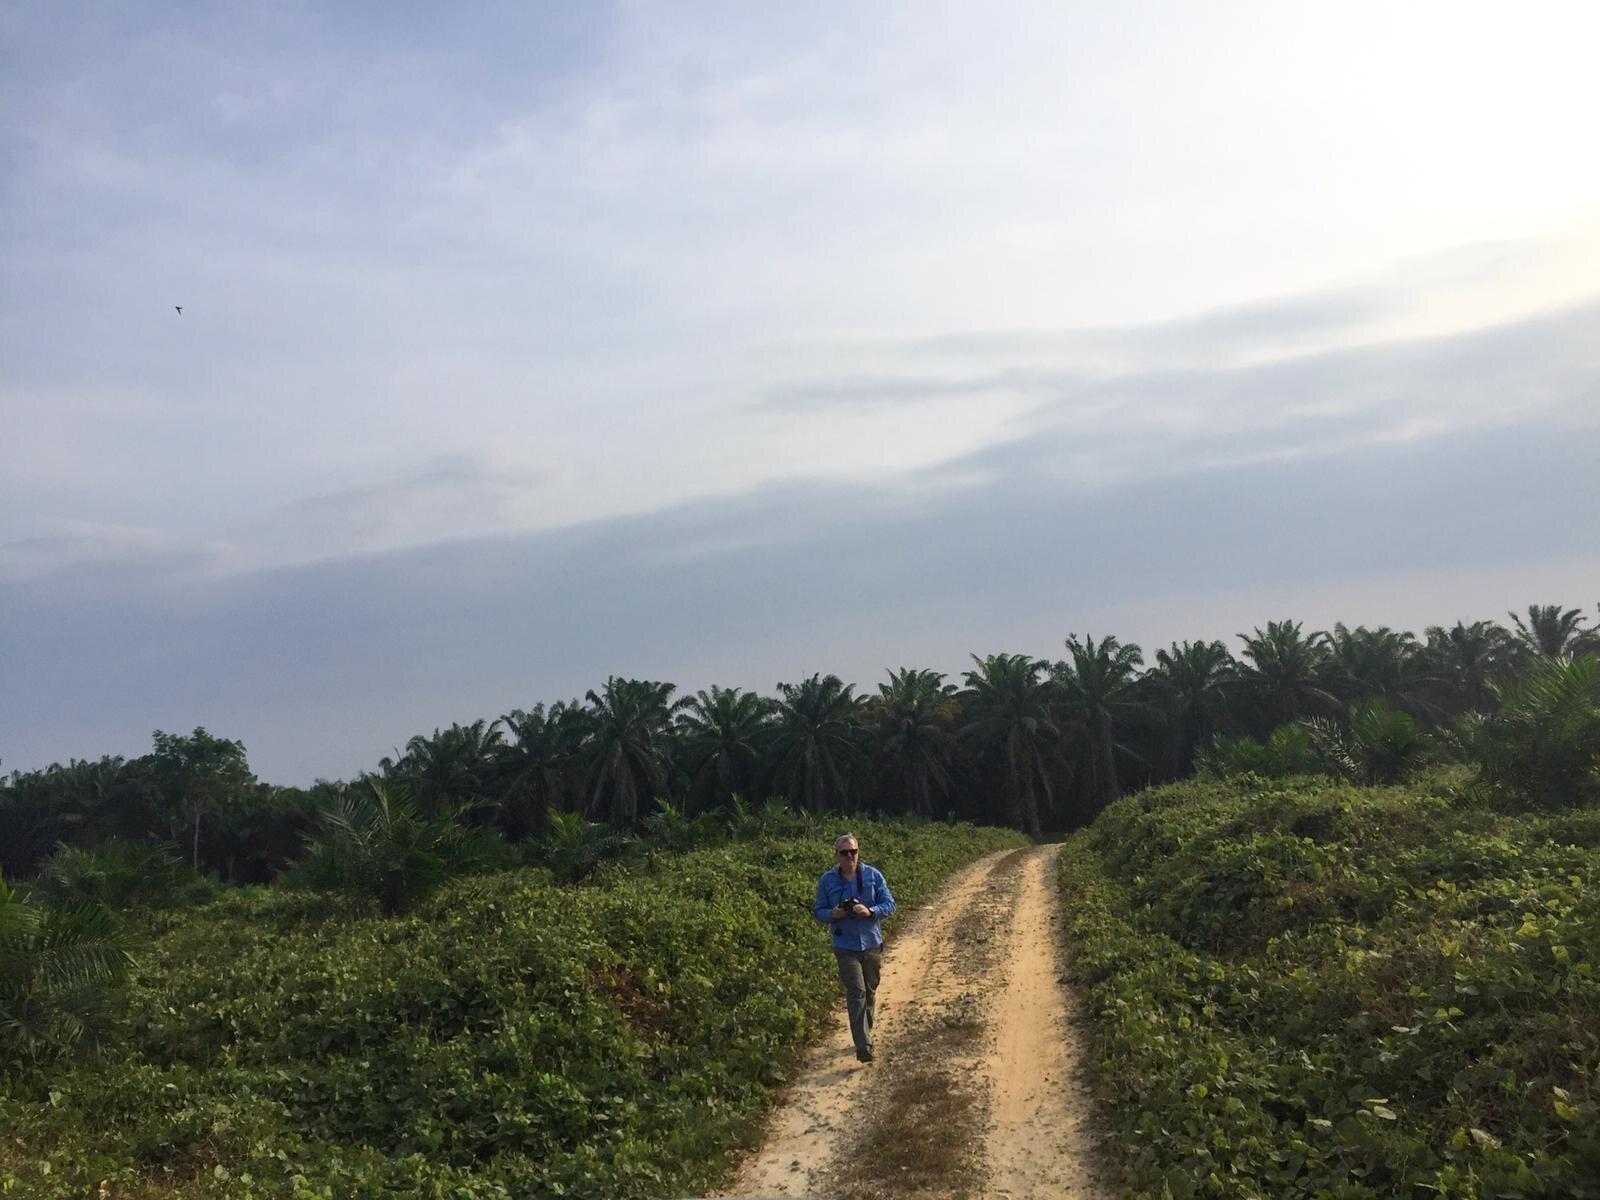 Mr Arthur Cameron completing pasture yield assessment, South Sumatra, August 2019.  Photo: Kieren McCosker